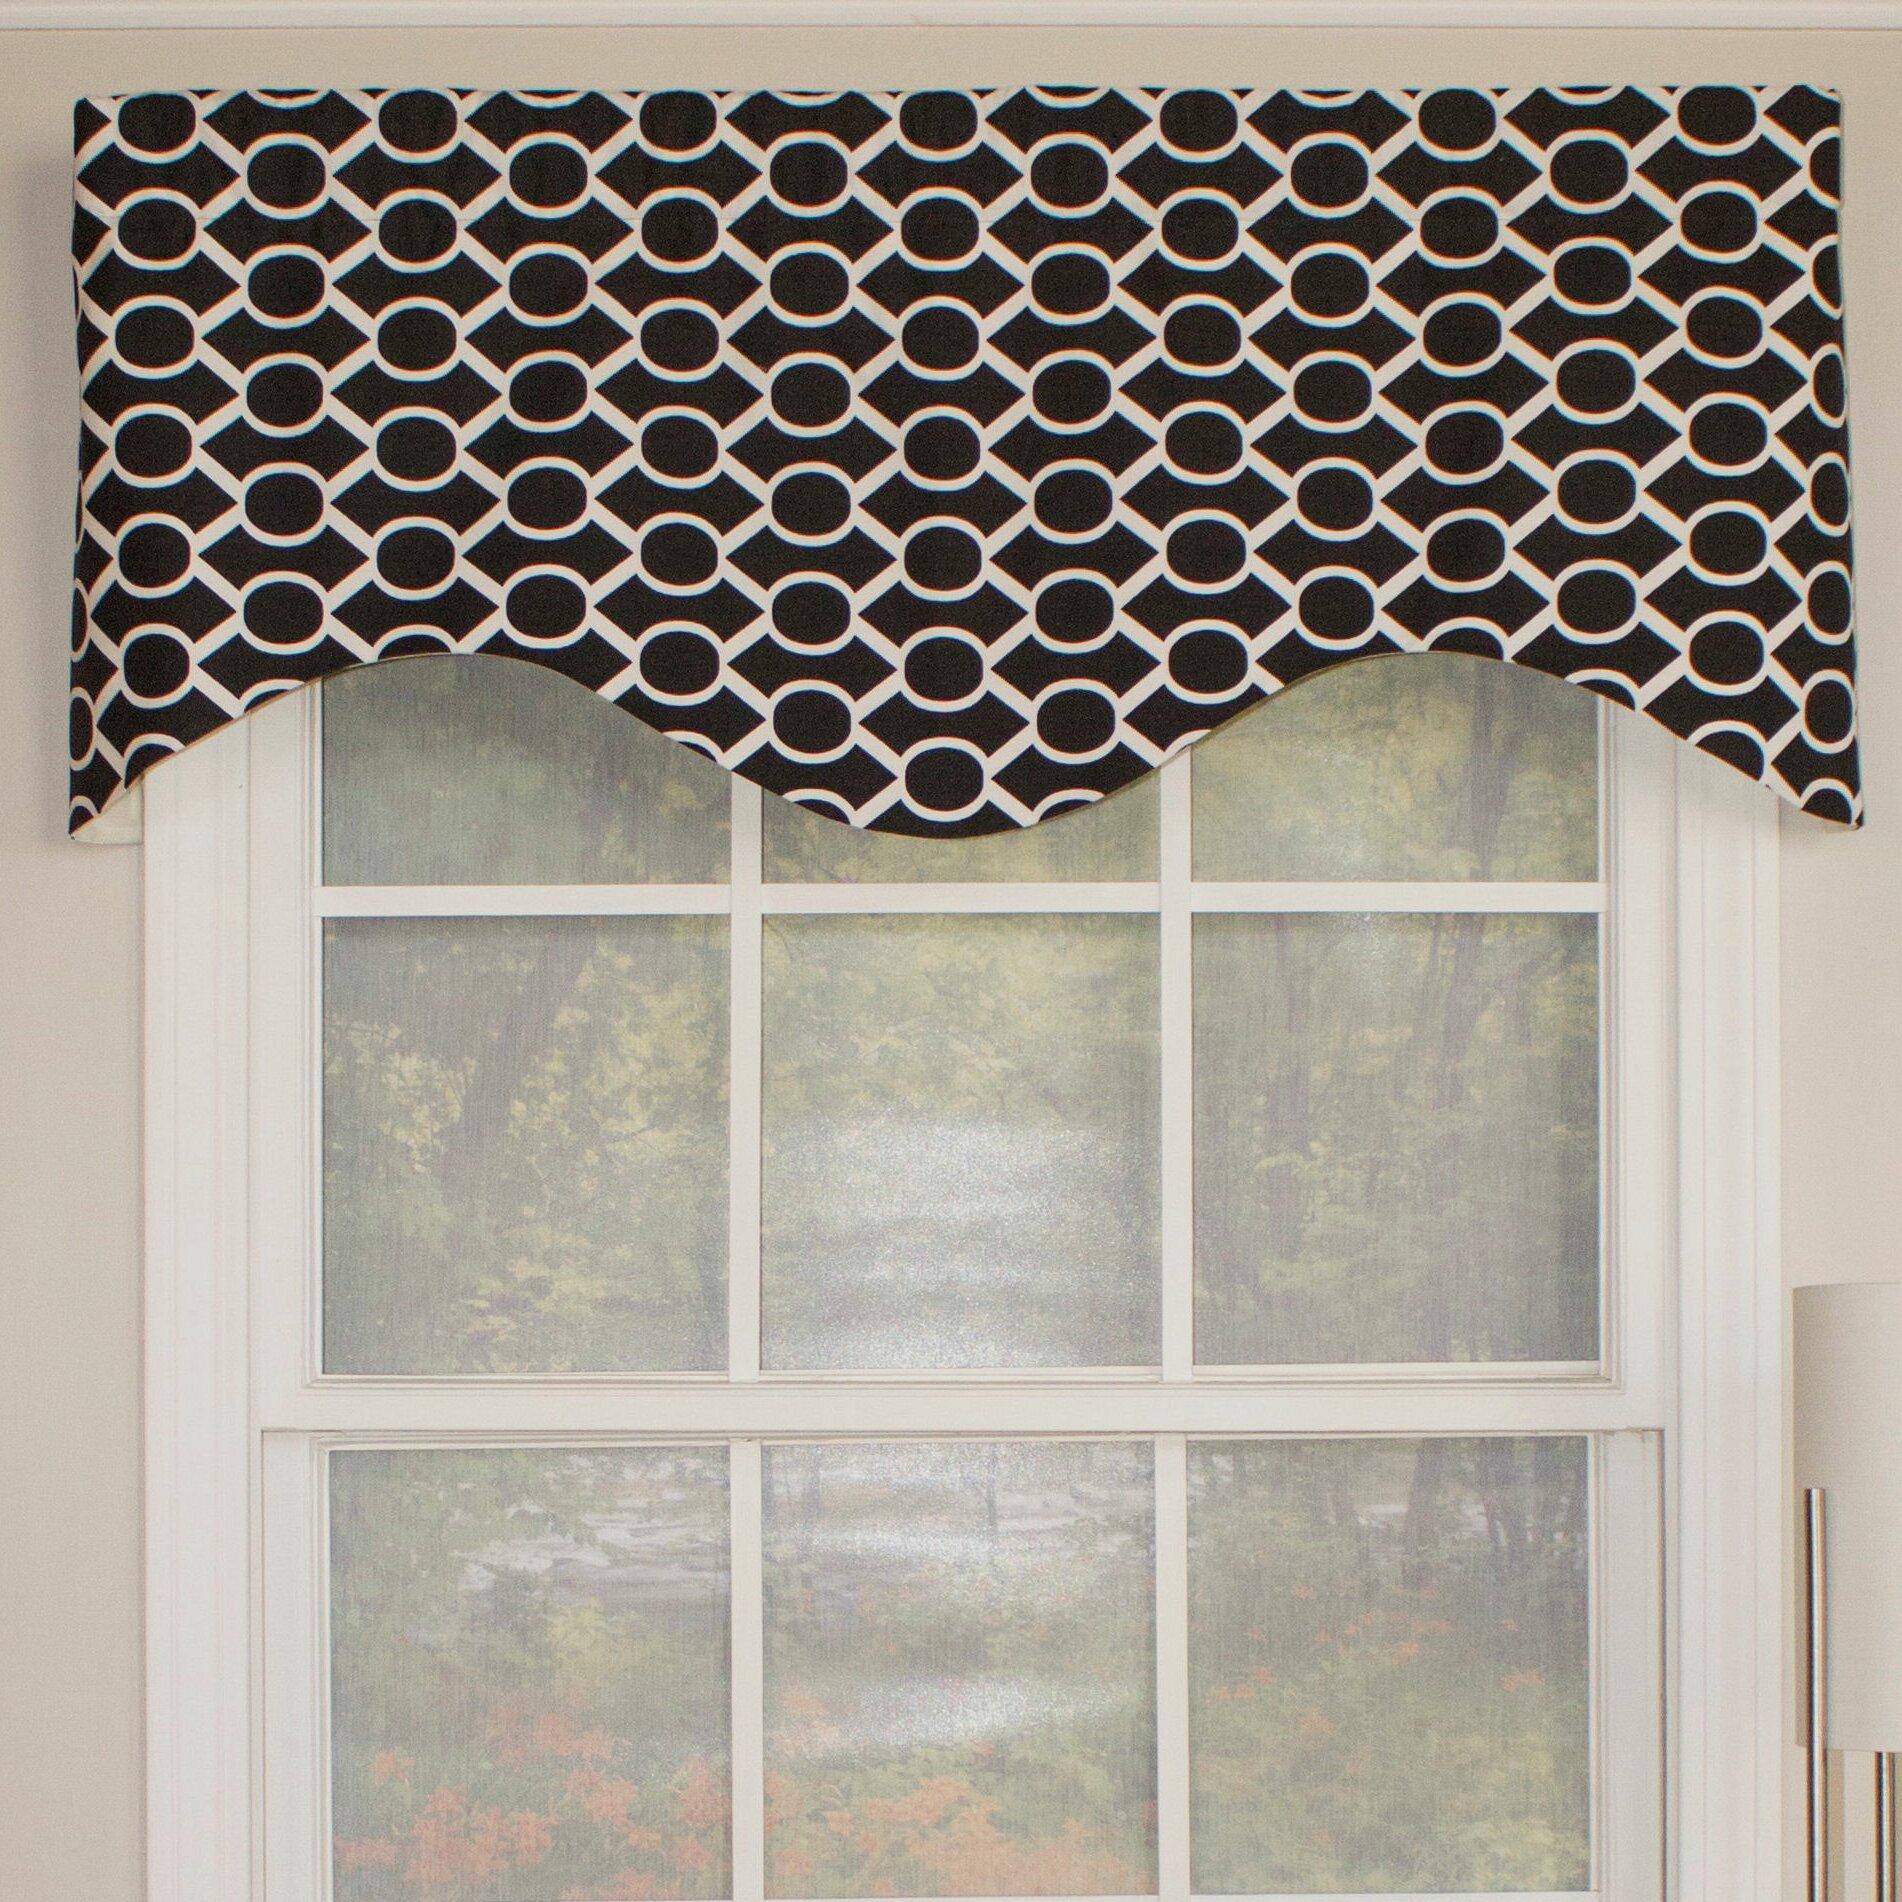 Rlf Home Sydney Cornice 50 Curtain Valance Reviews